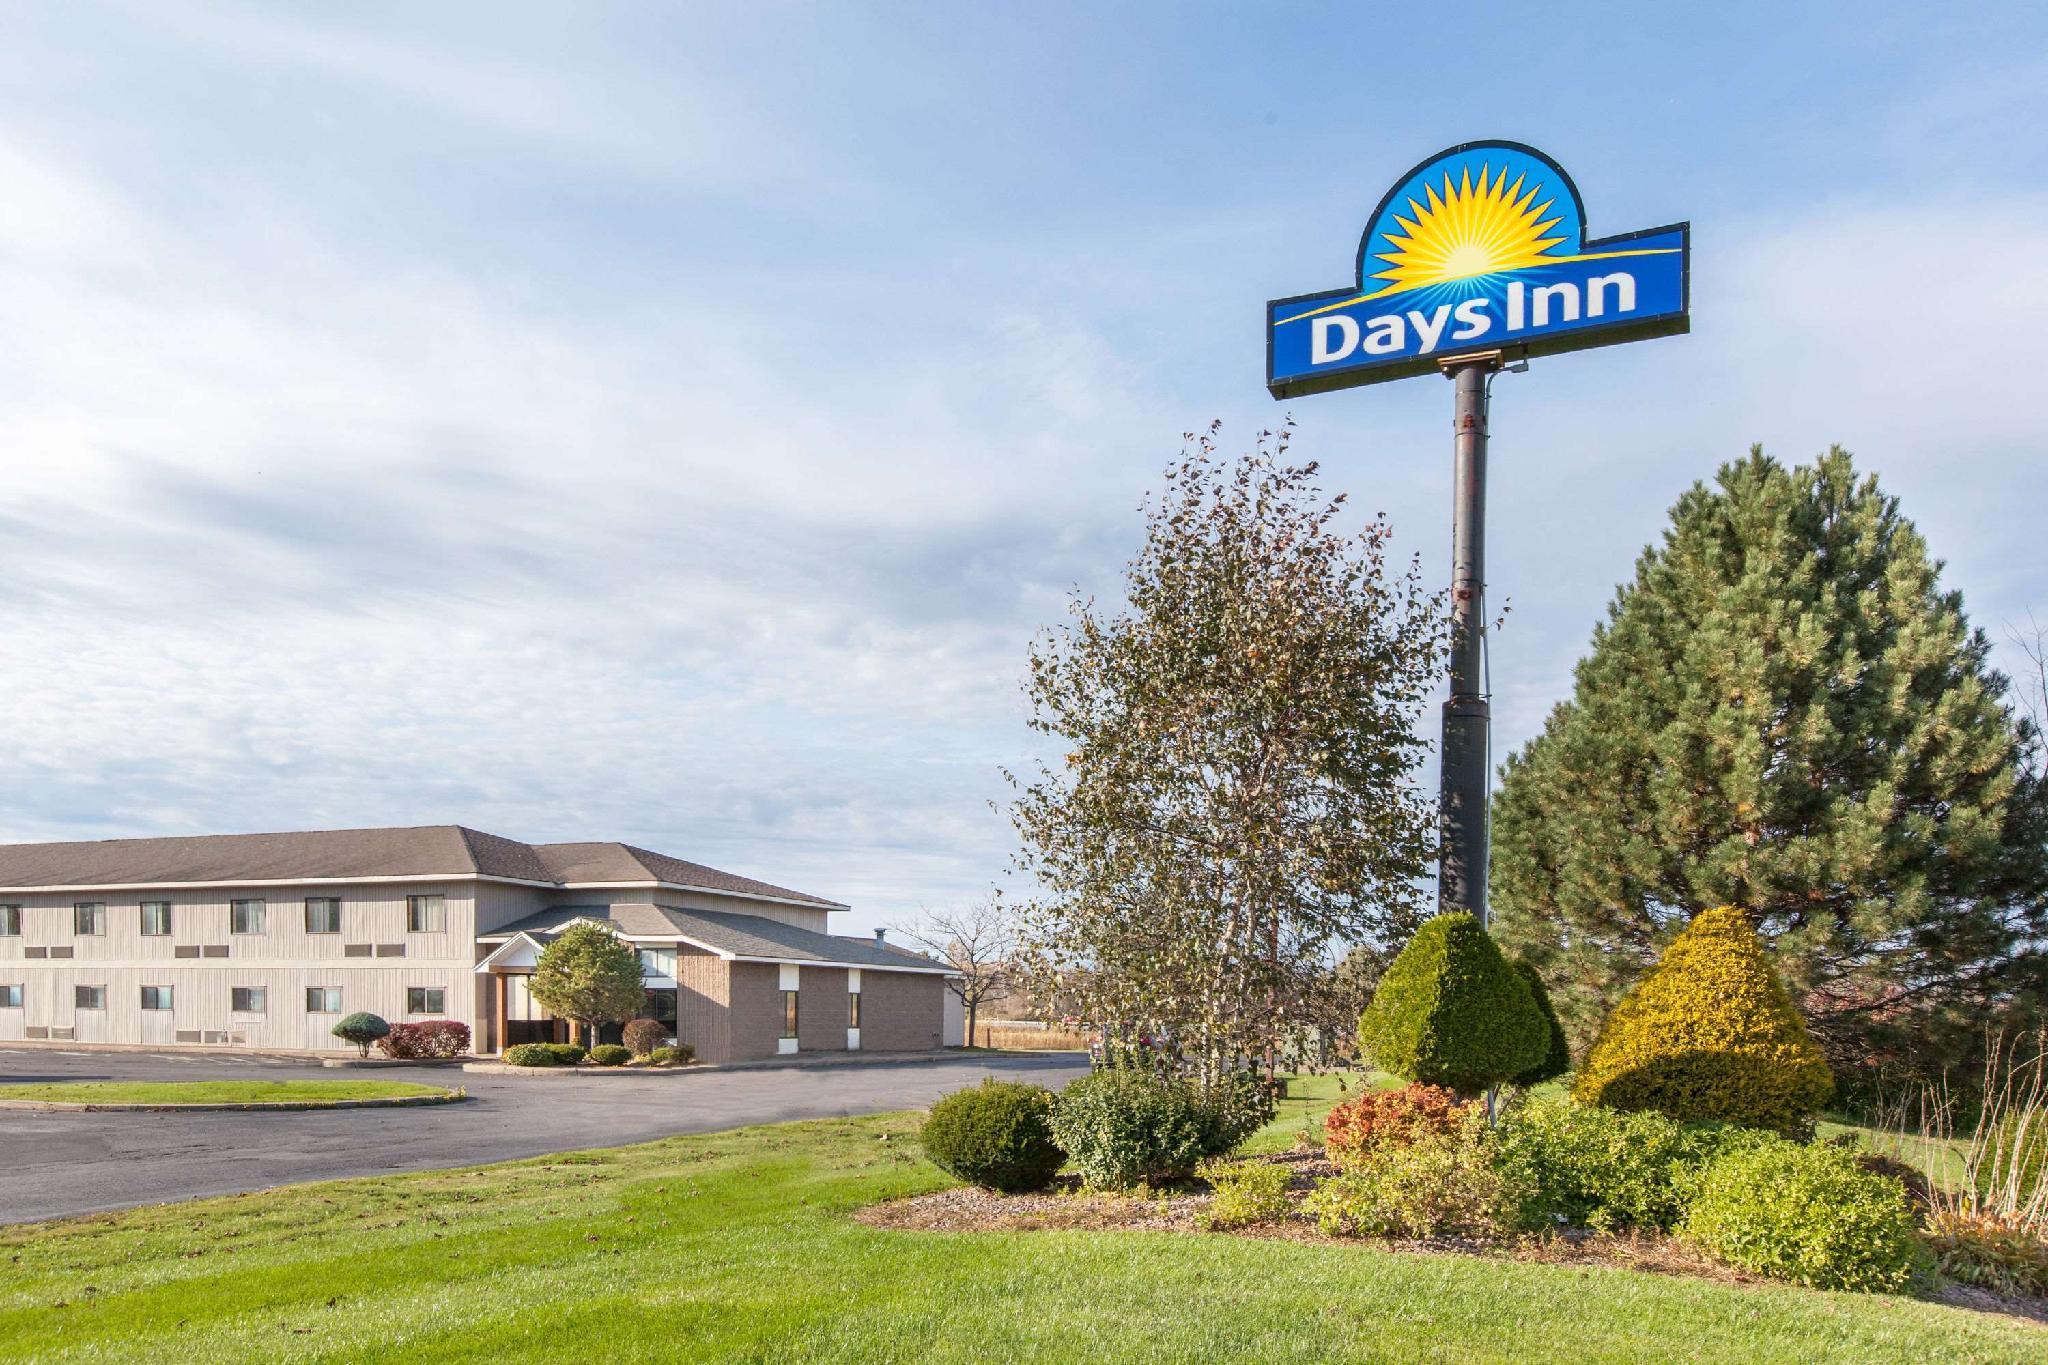 Days Inn by Wyndham Canastota/Syracuse, Madison